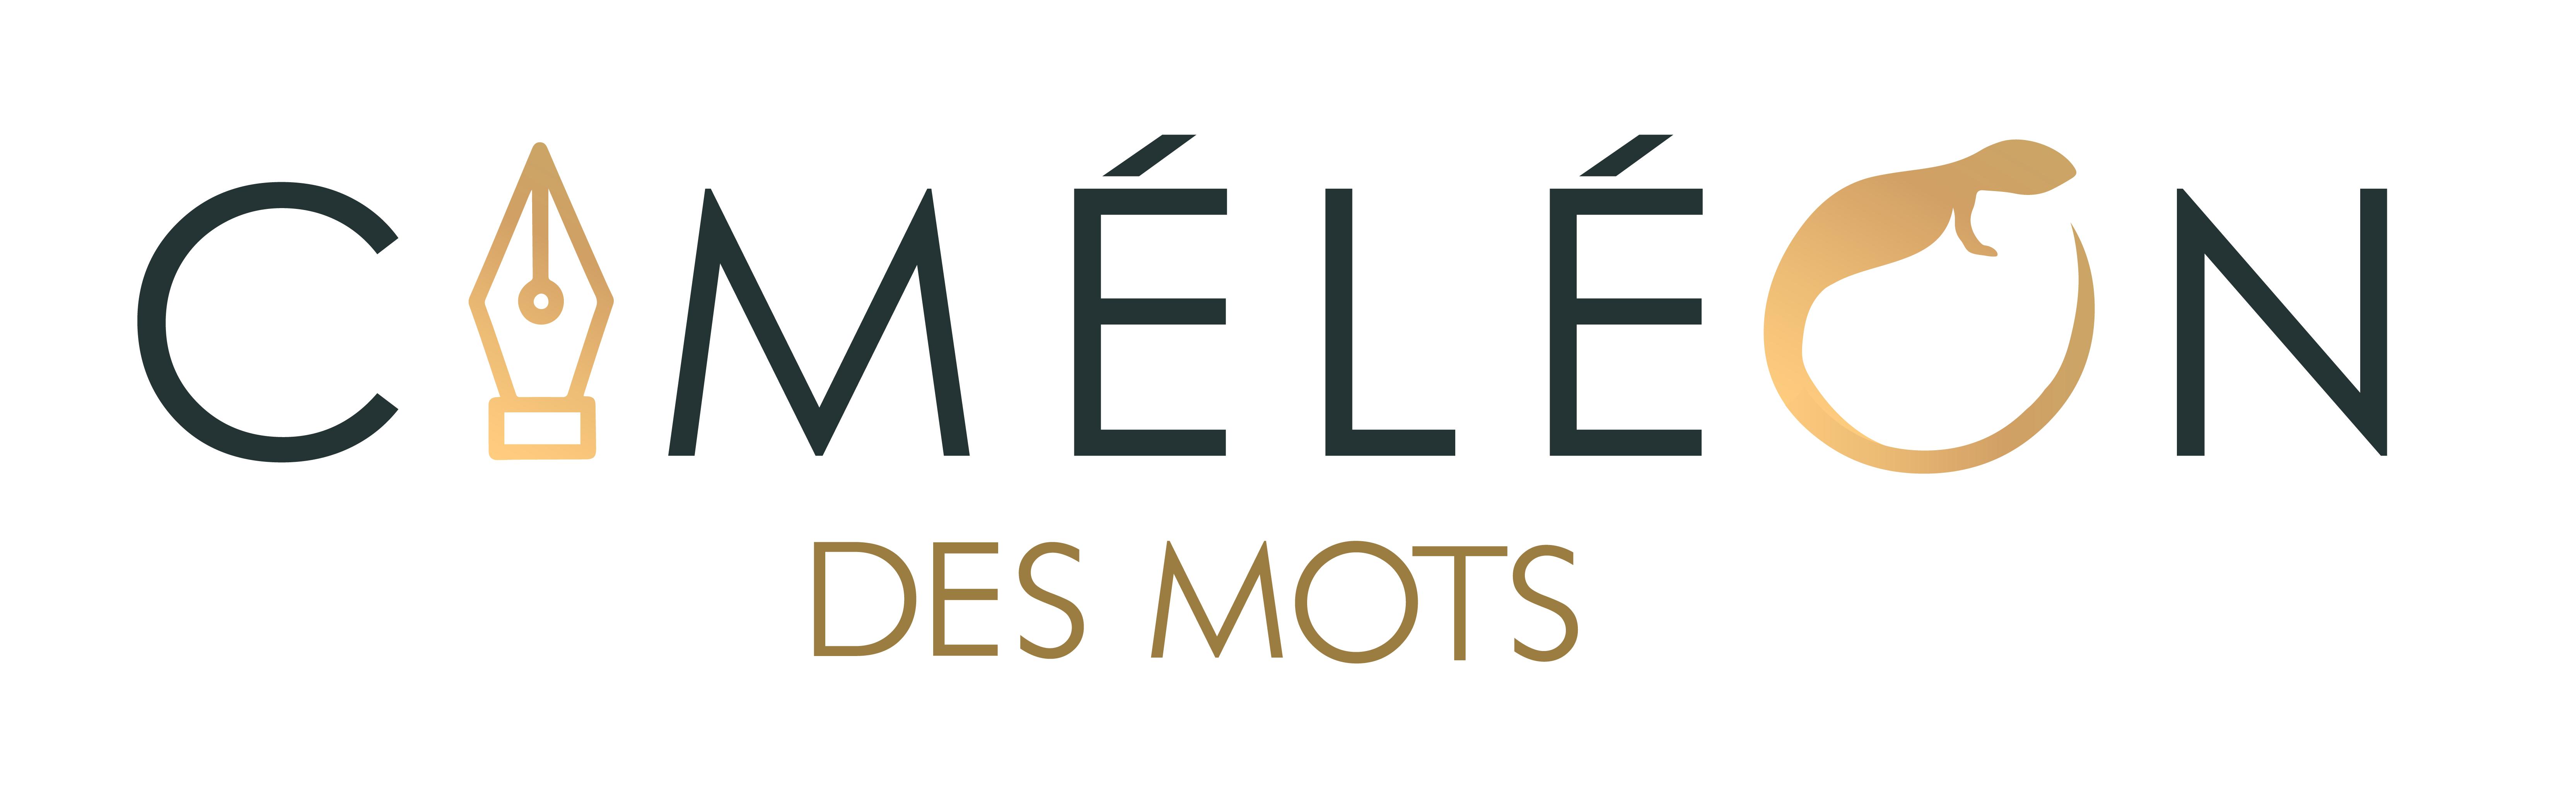 Caméléon des Mots - Copywriting & Storytelling